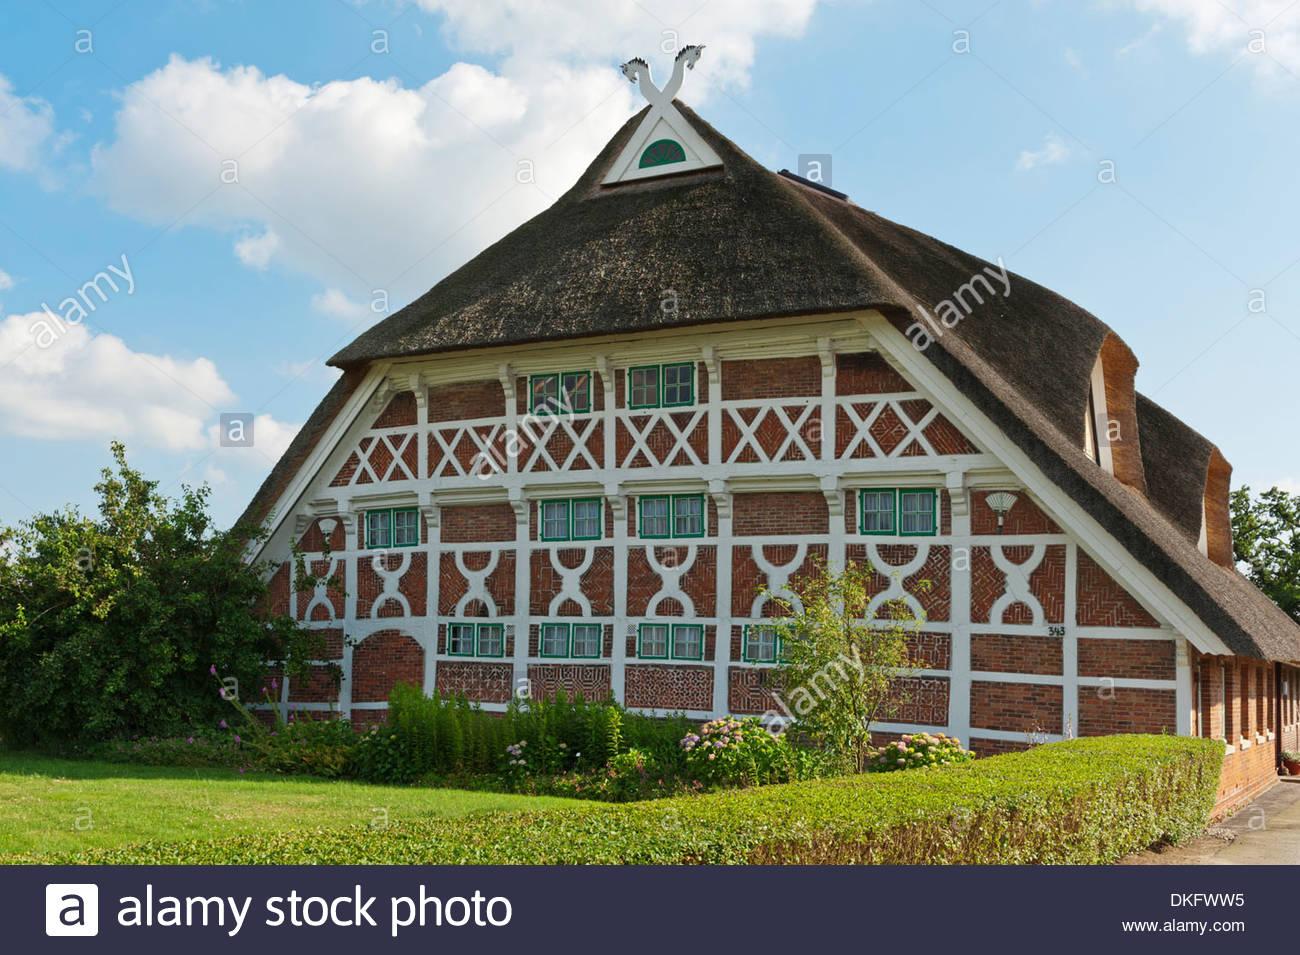 Fade of a historical timber-framed house, Vier- und Marschlande, Hamburg, Germany - Stock Image